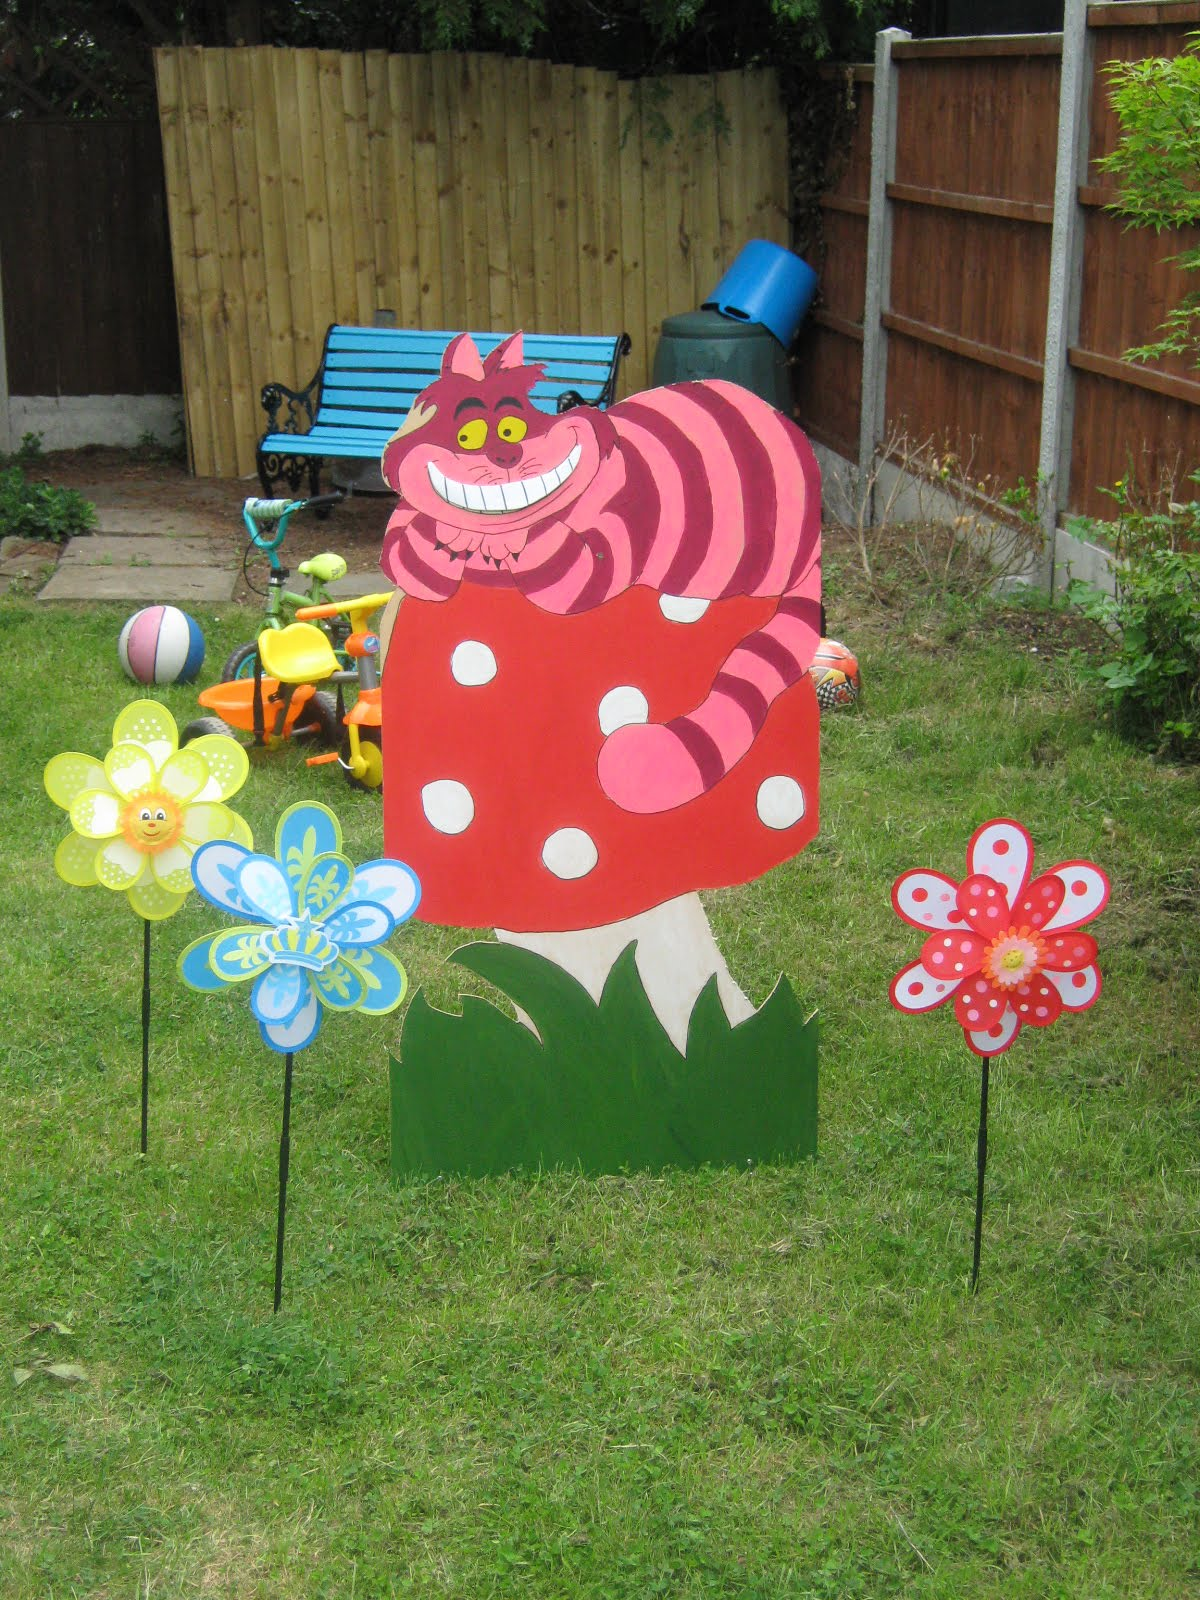 Alice In Wonderland Decorations Alice In Wonderland Birthday Party Supplies Uk Party Supplies